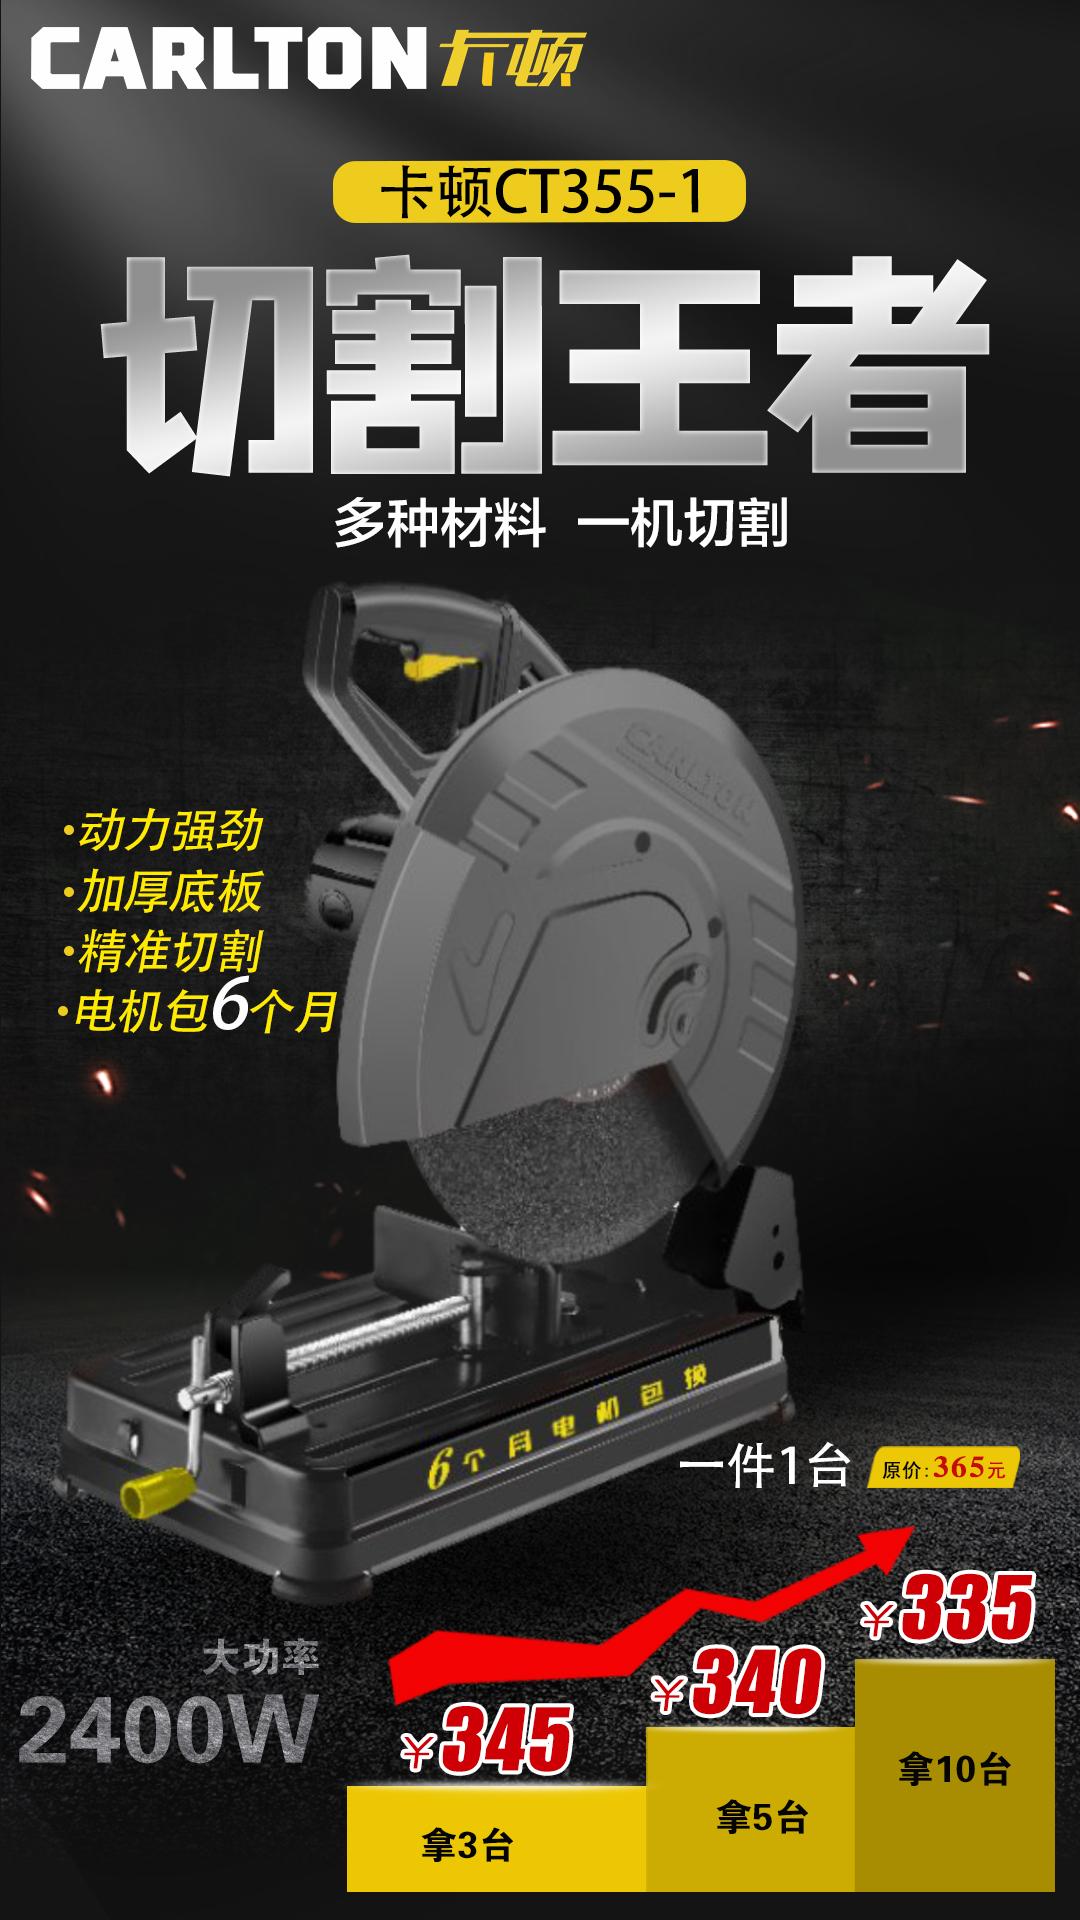 https://www.iruitai.com/system/upfiles/shop/article/06553866537760833.jpg